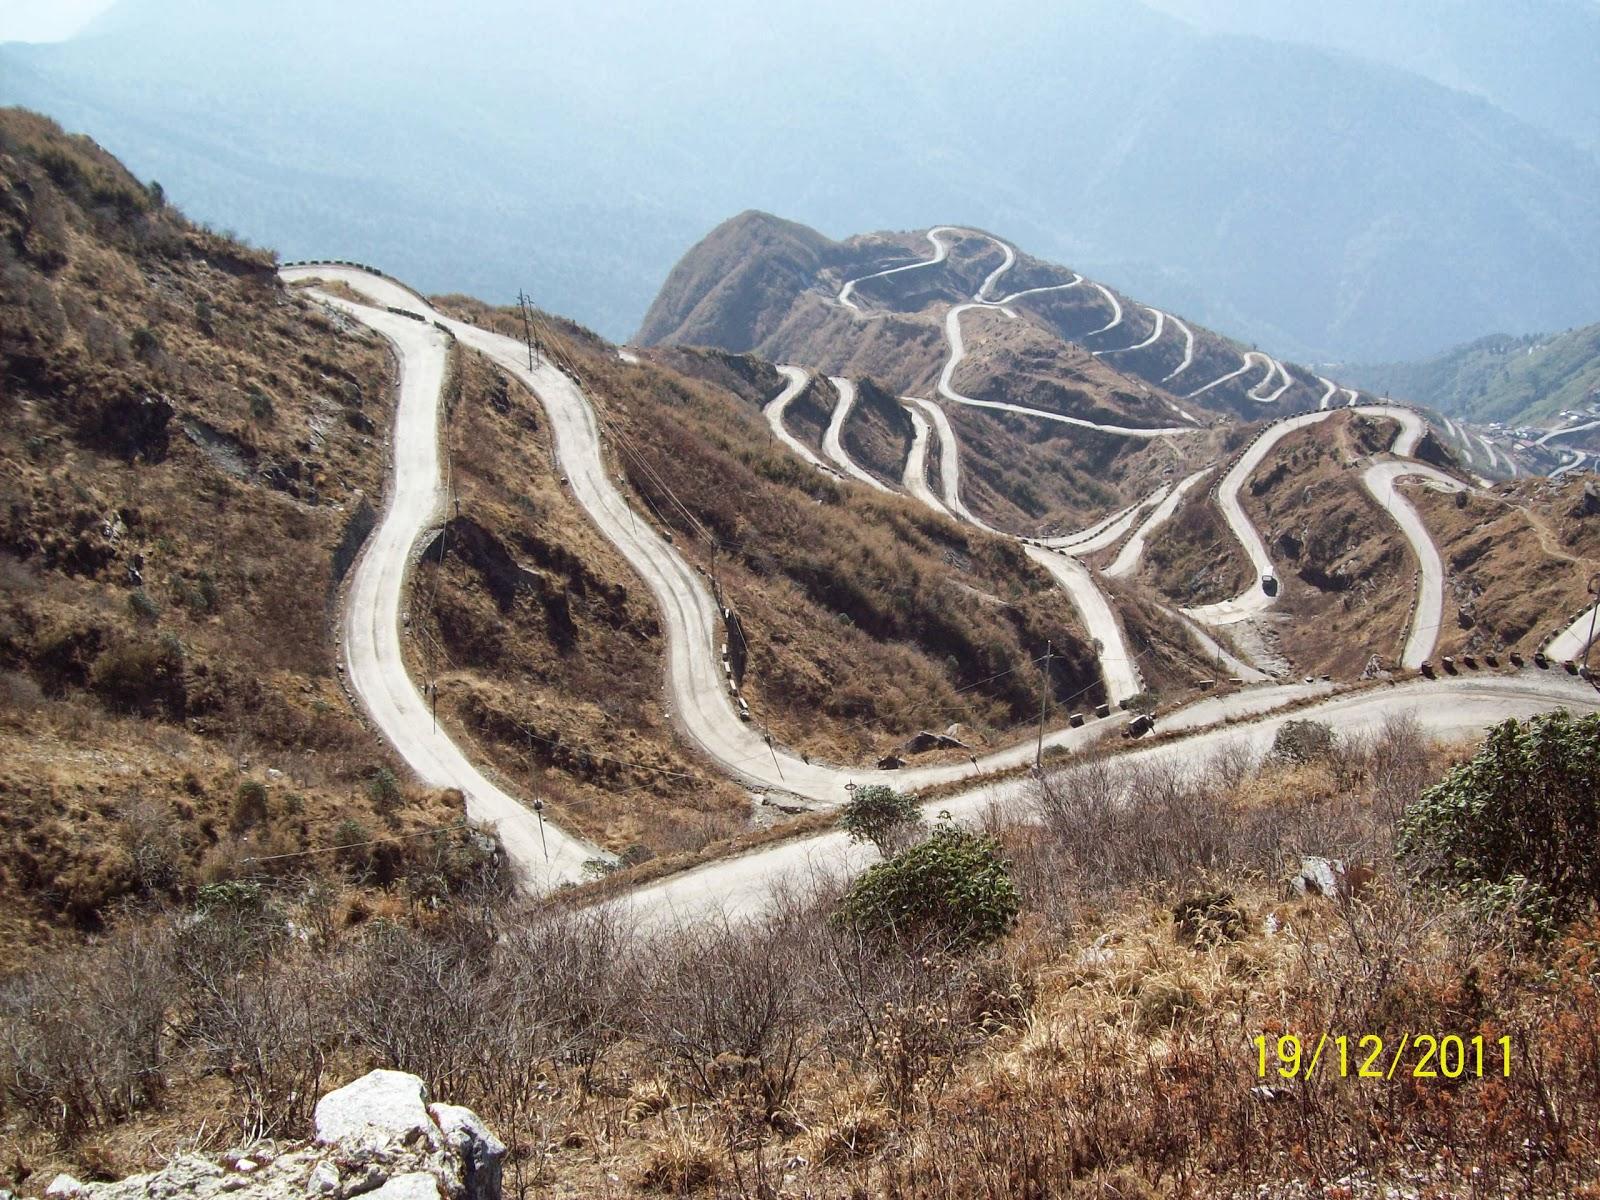 Sikkim ,Zuluk, nathula Pass: Sikkim , Zuluk , Nathula pass